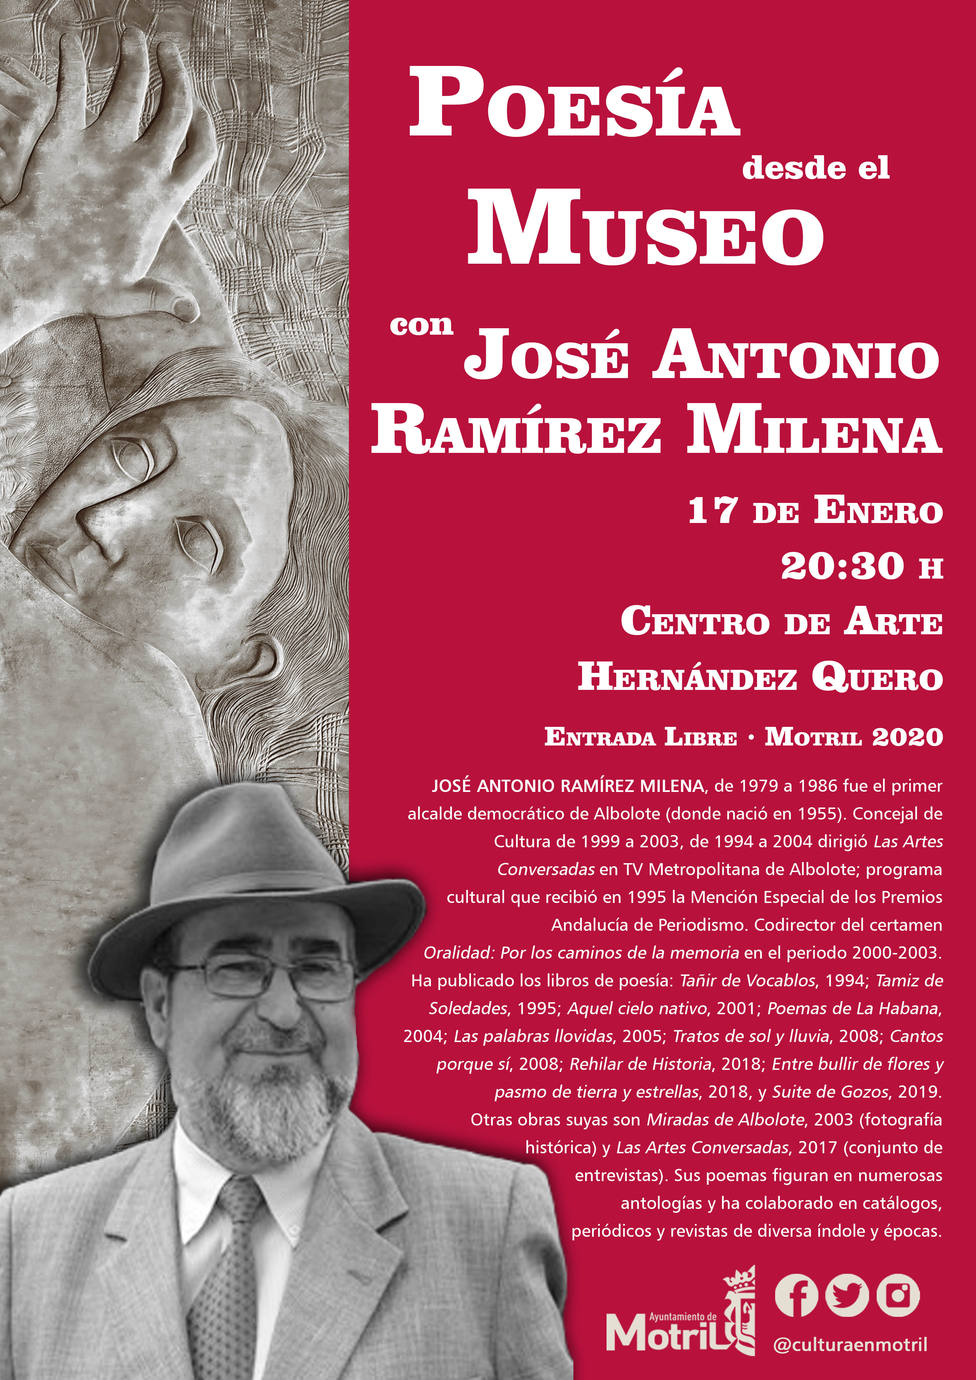 José Antonio Ramírez Milena